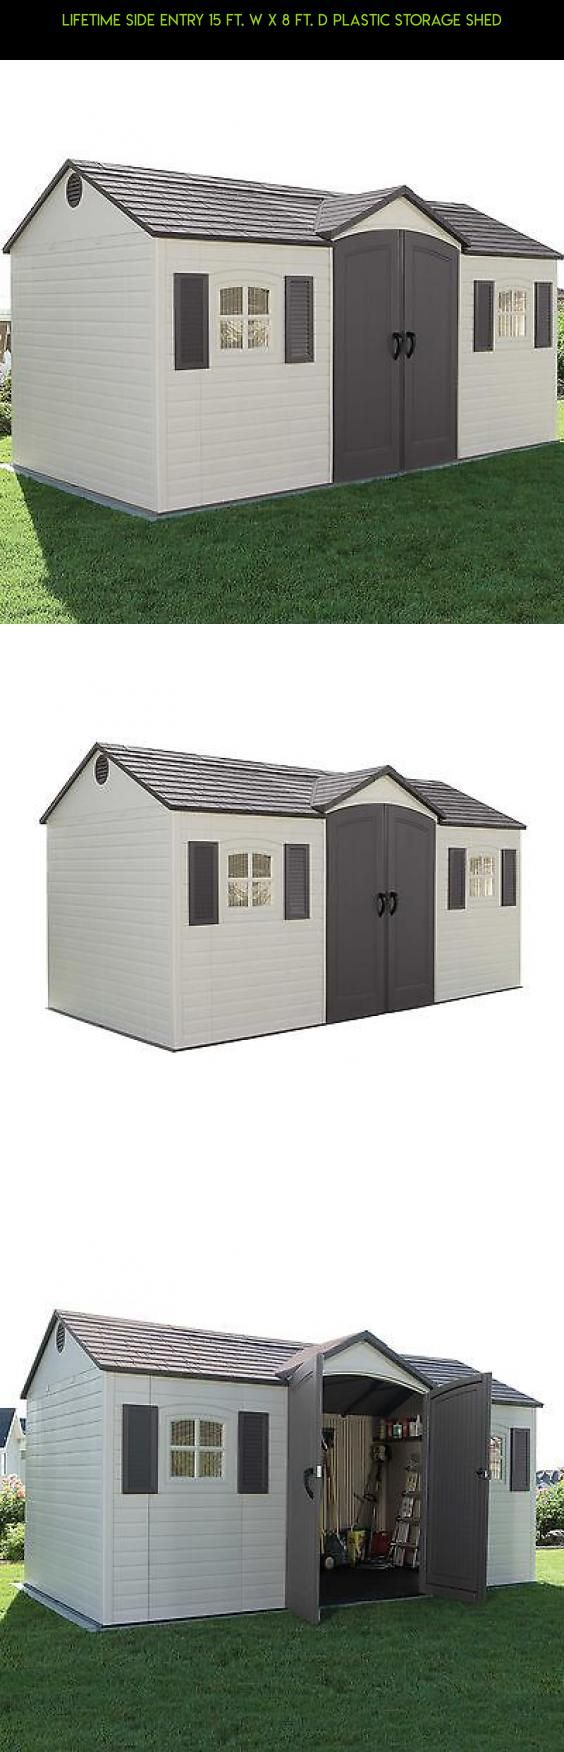 best 25 shed kits ideas on pinterest storage shed kits wood